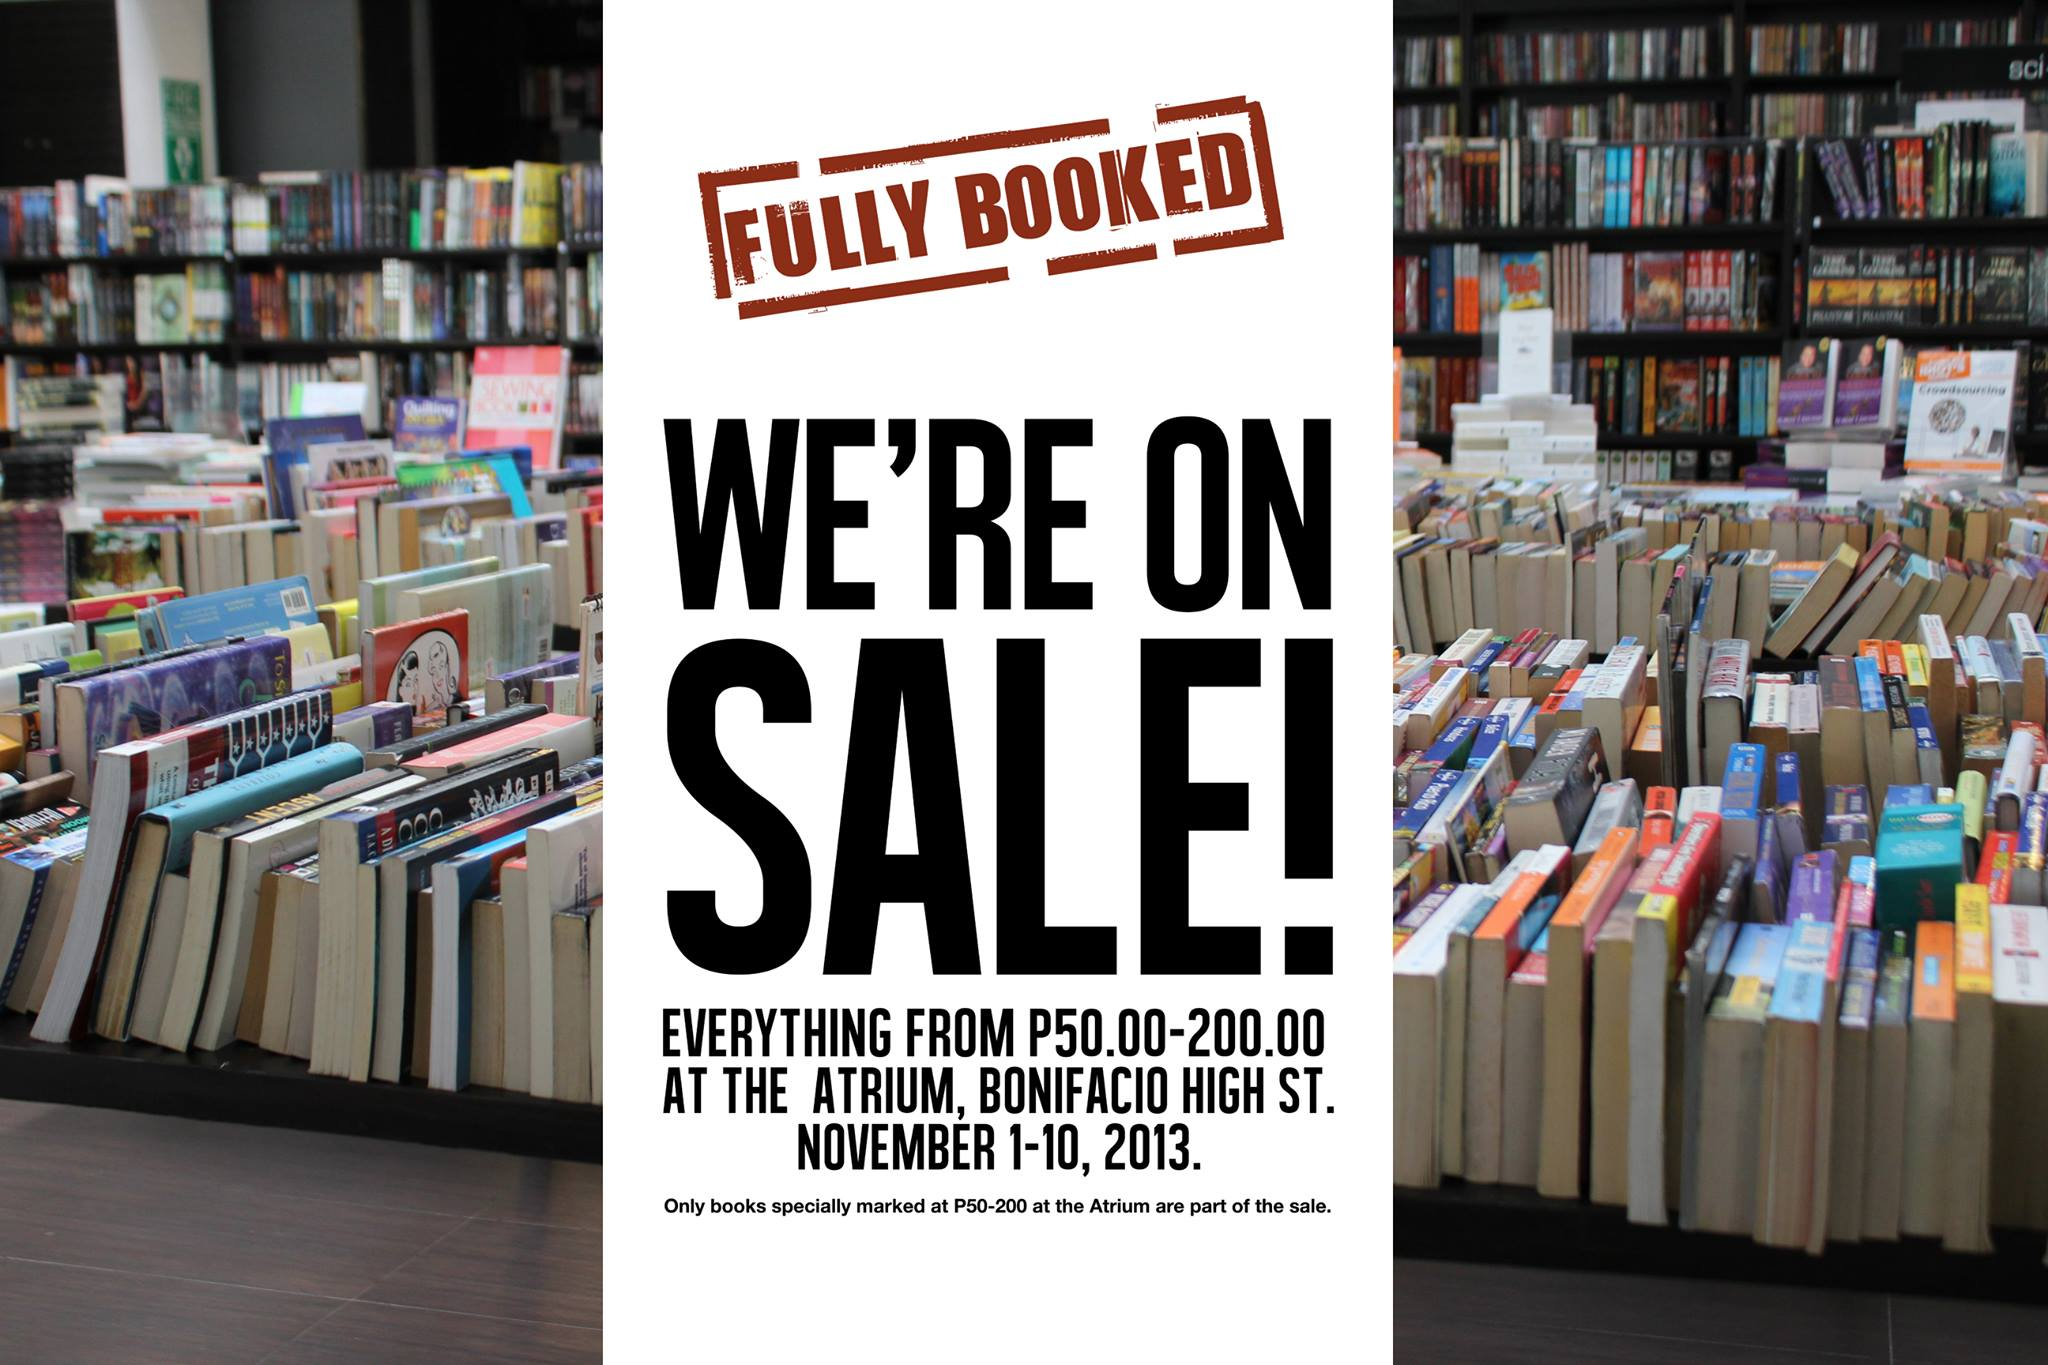 Fully Booked Sale @ Bonifacio High Street November 2013